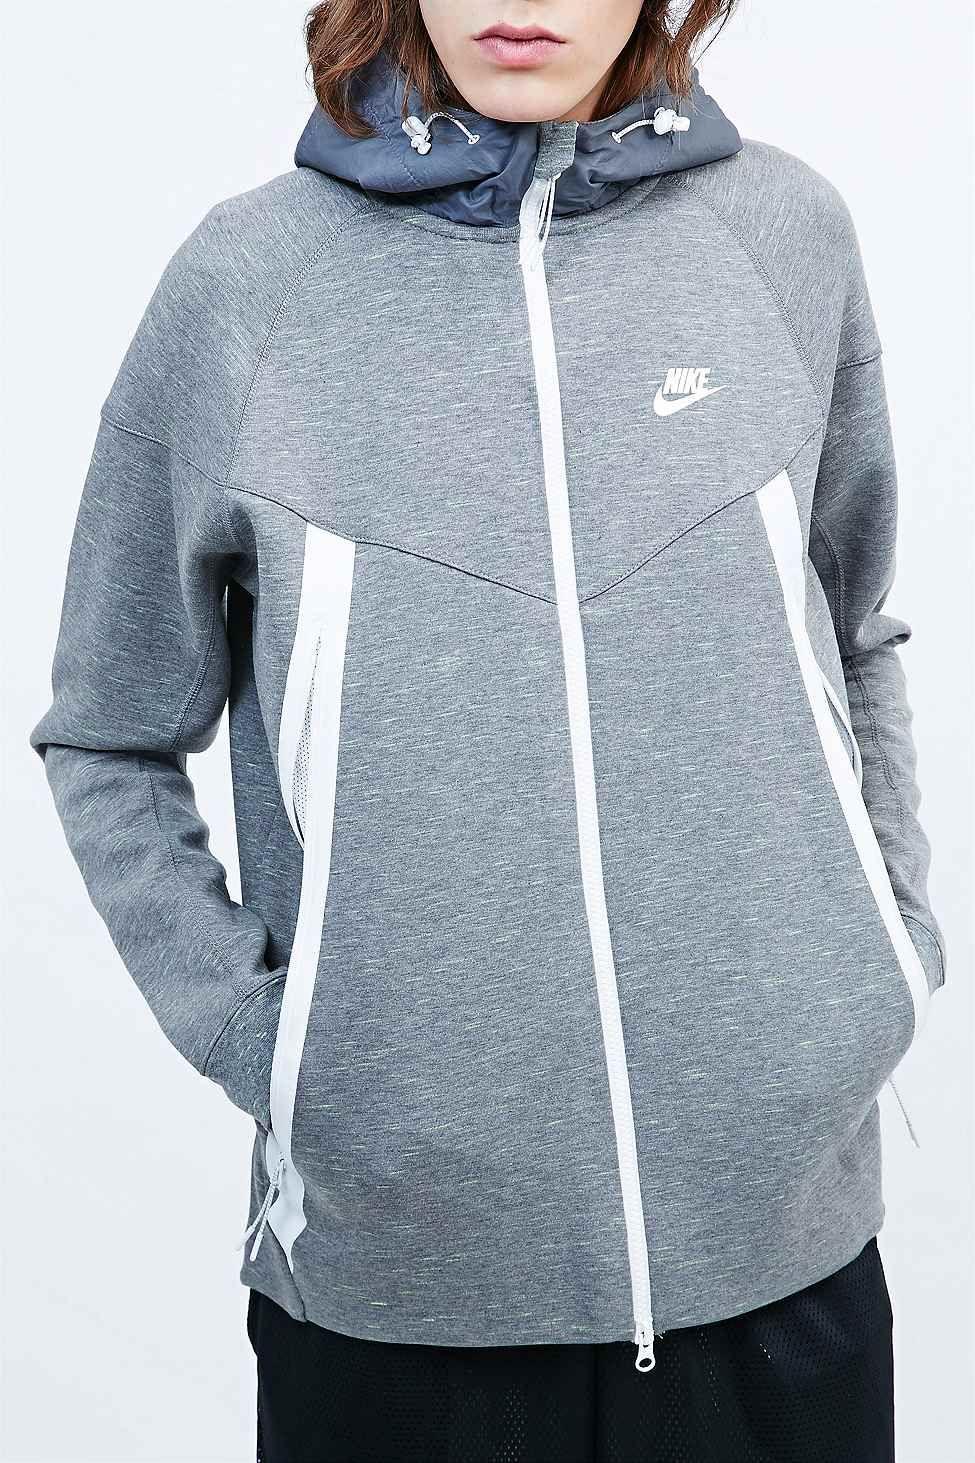 Nike Tech Fleece Super Zip Hoodie in Grey Ropa, Invierno